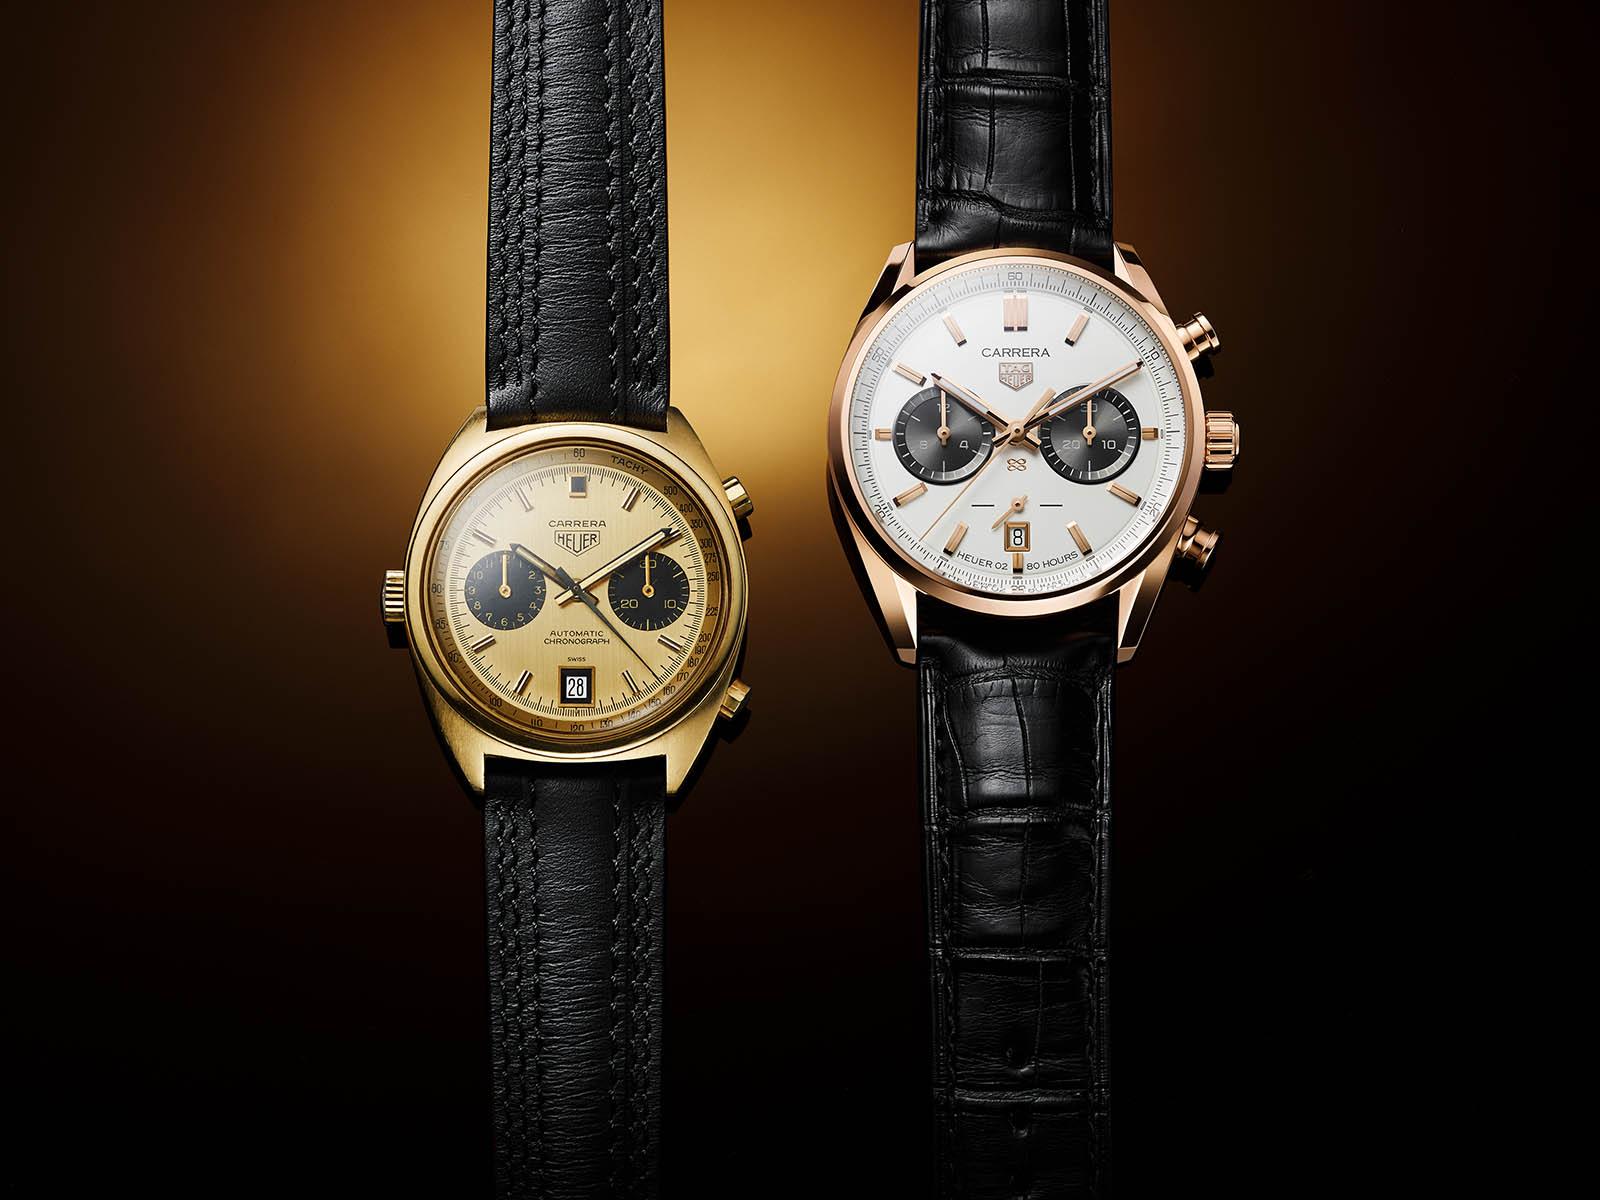 cbn2041-fc8306-tag-heuer-carrera-chronograph-jack-heuer-birthday-gold-1.jpg